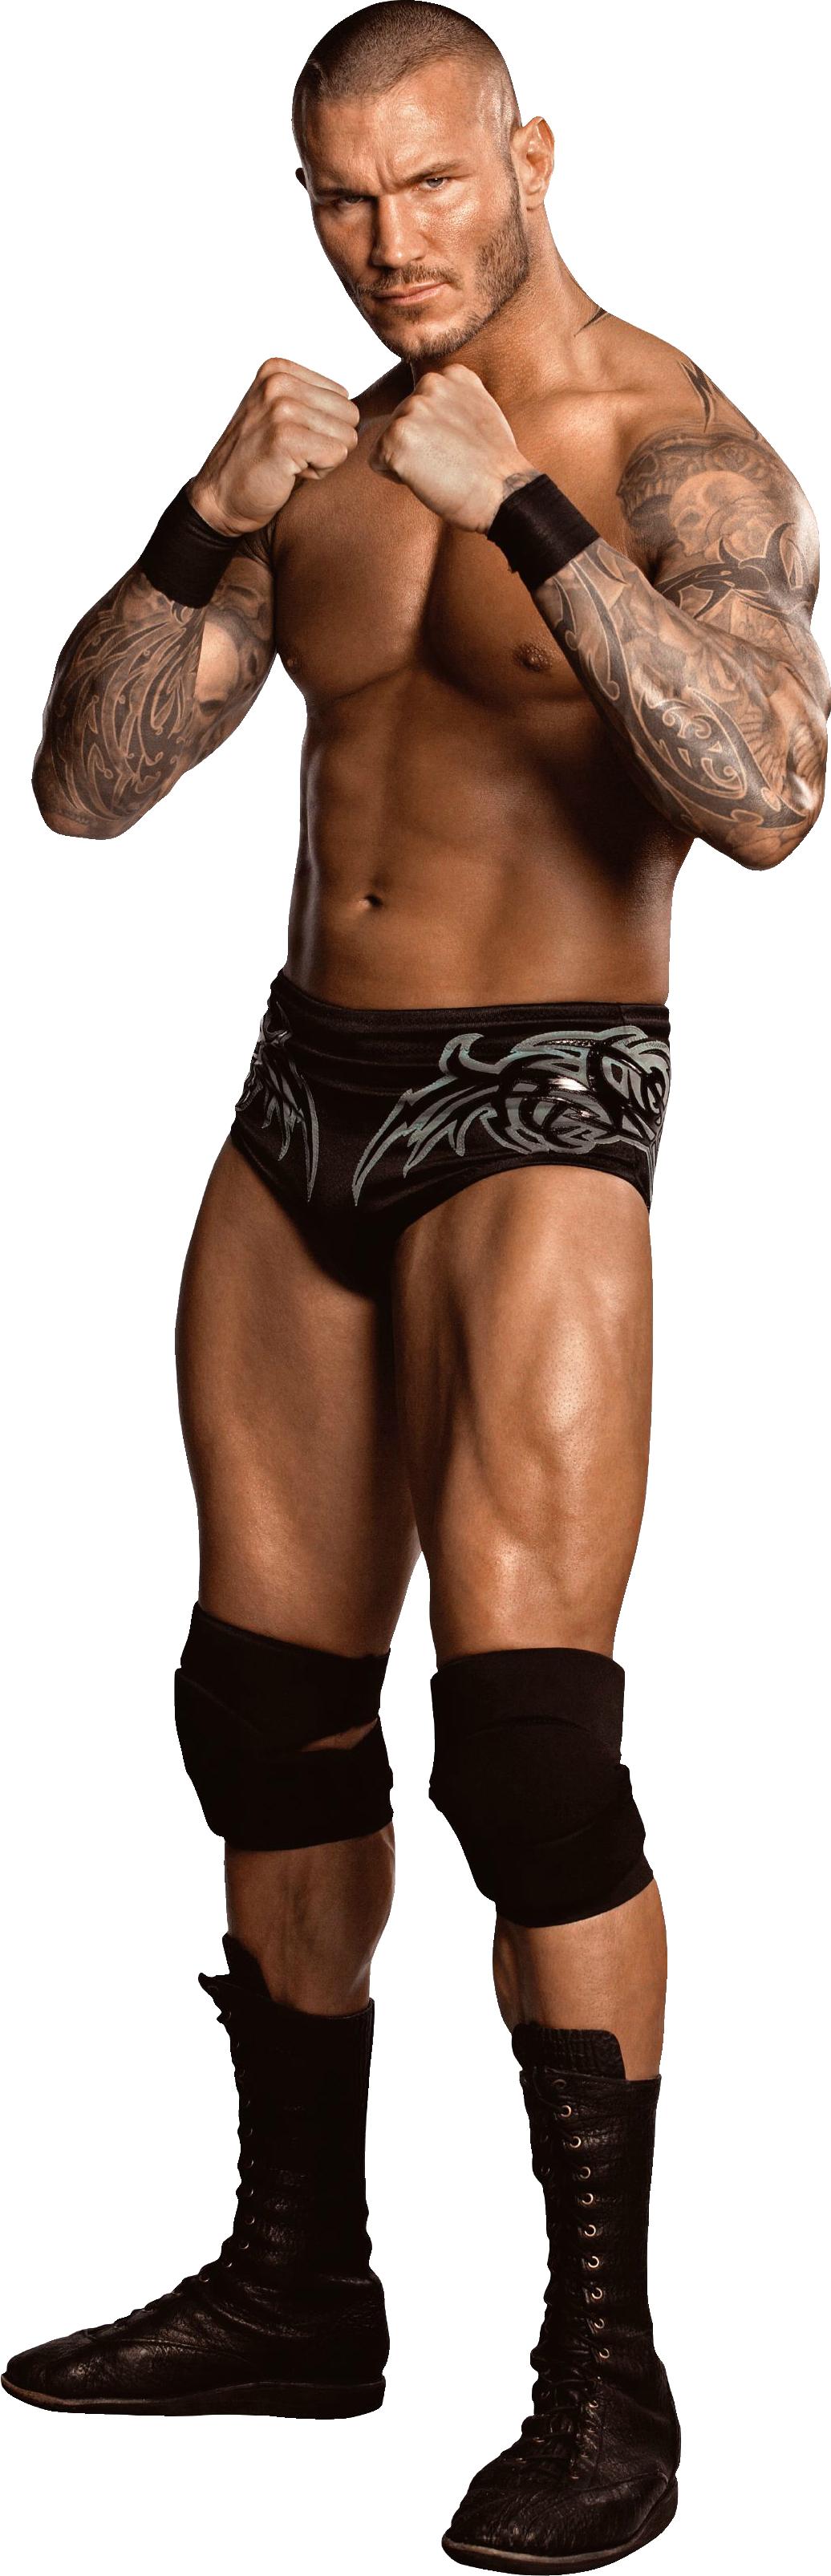 Randy Orton PNG Transparent Randy Orton.PNG Images..